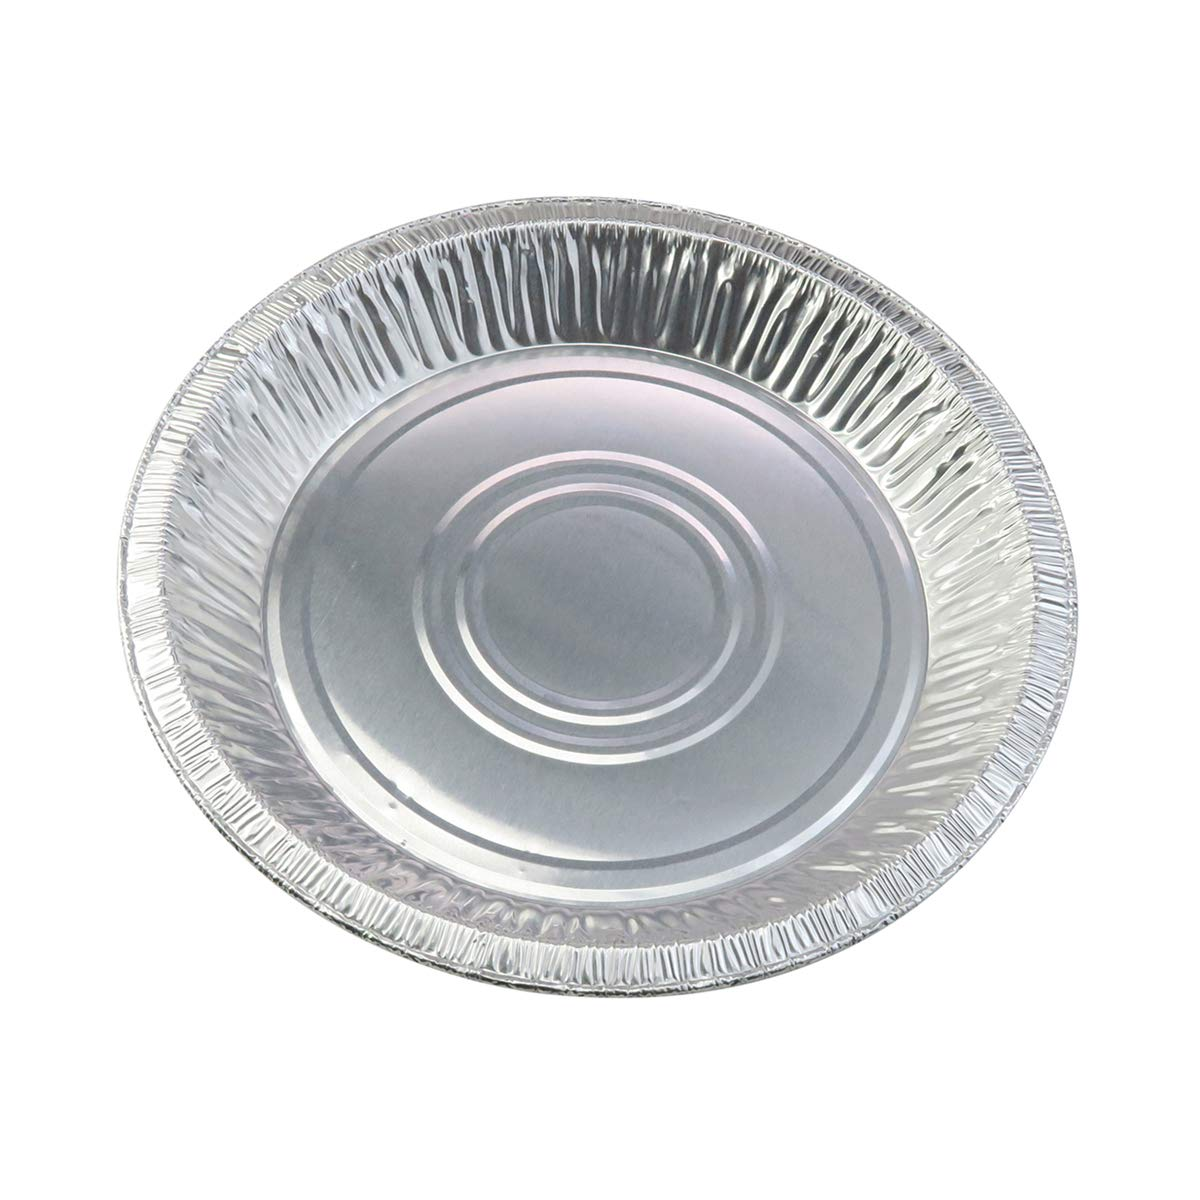 10'' (Rim to RIm 9-5/8'')  Disposable Aluminum Pie Pans #1042- Pack of 12 by Safca